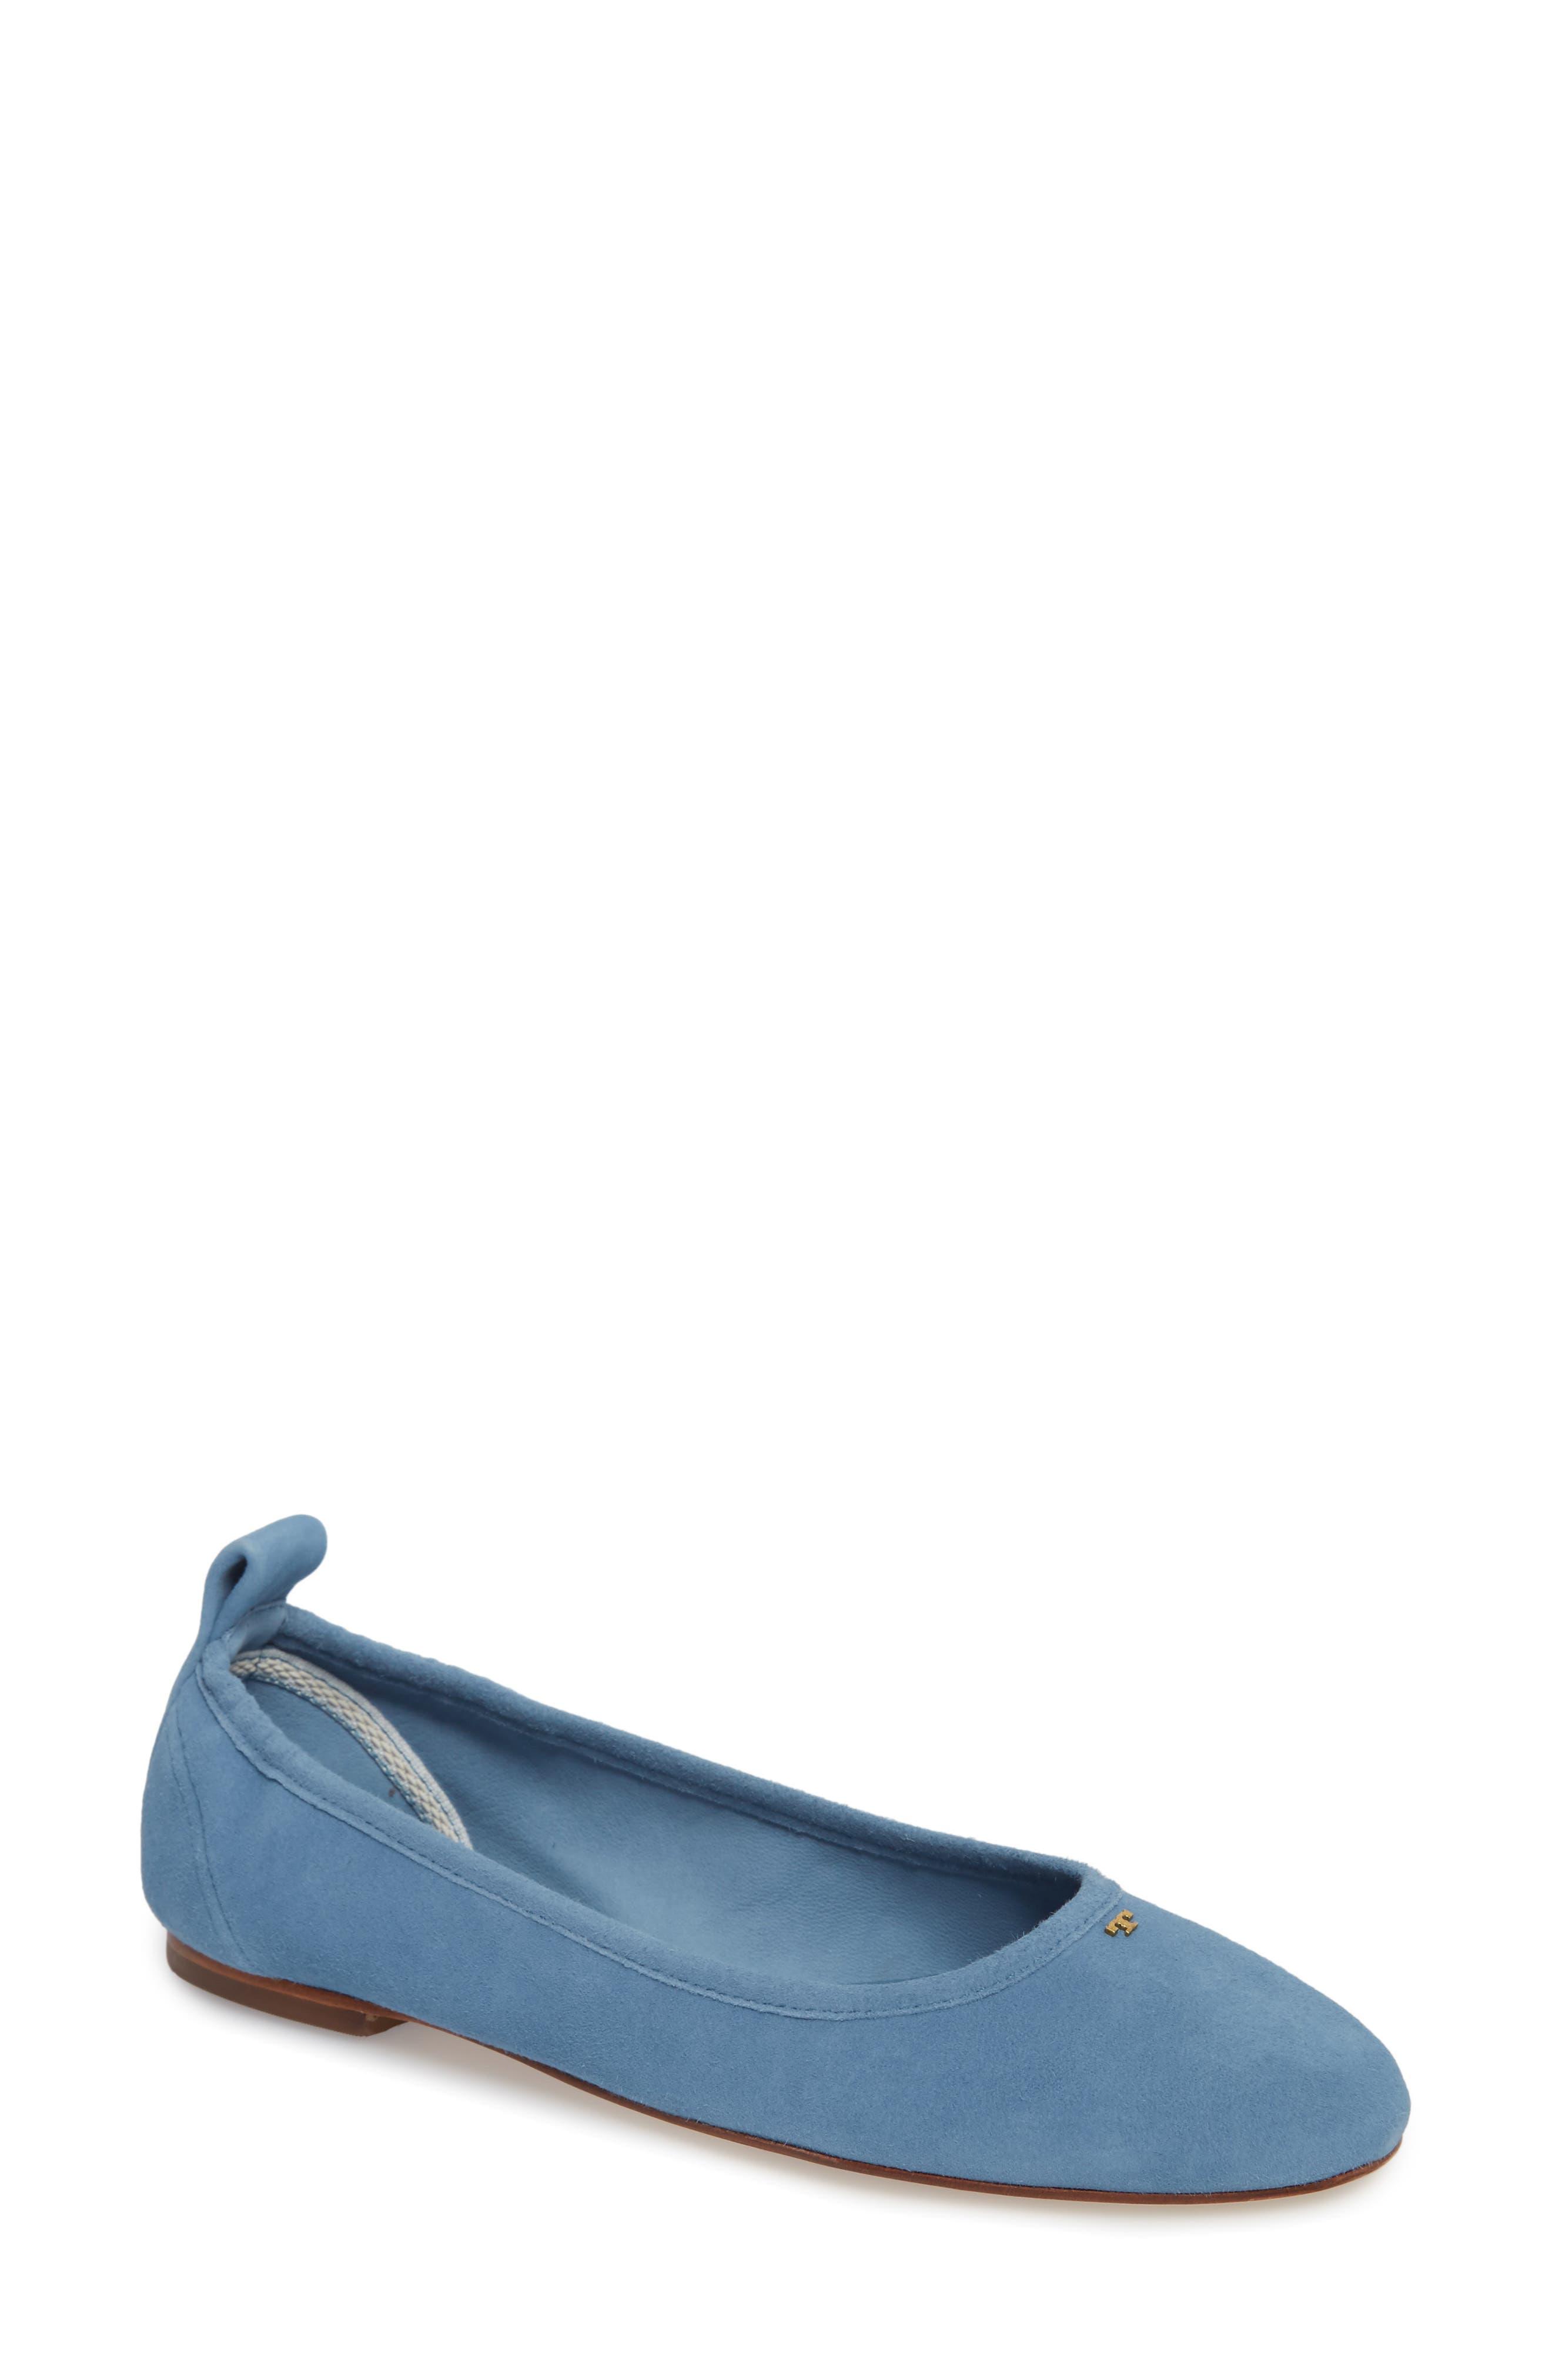 Therese Ballet Flat,                             Main thumbnail 1, color,                             Blue Yonder